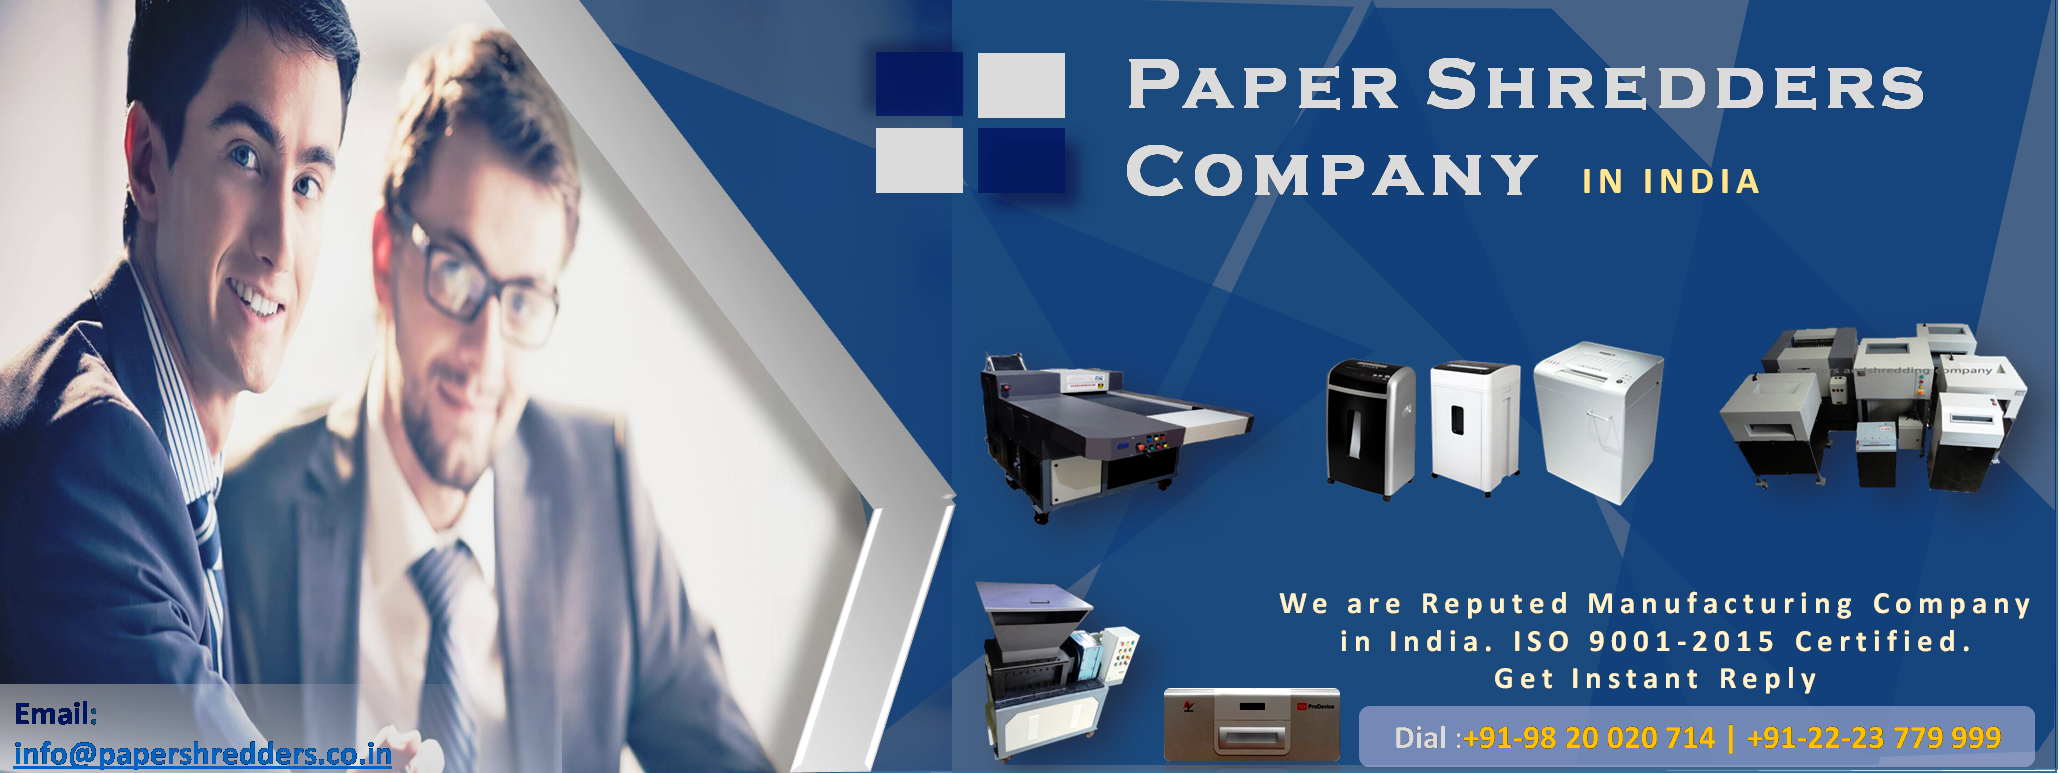 Paper Shredders Company